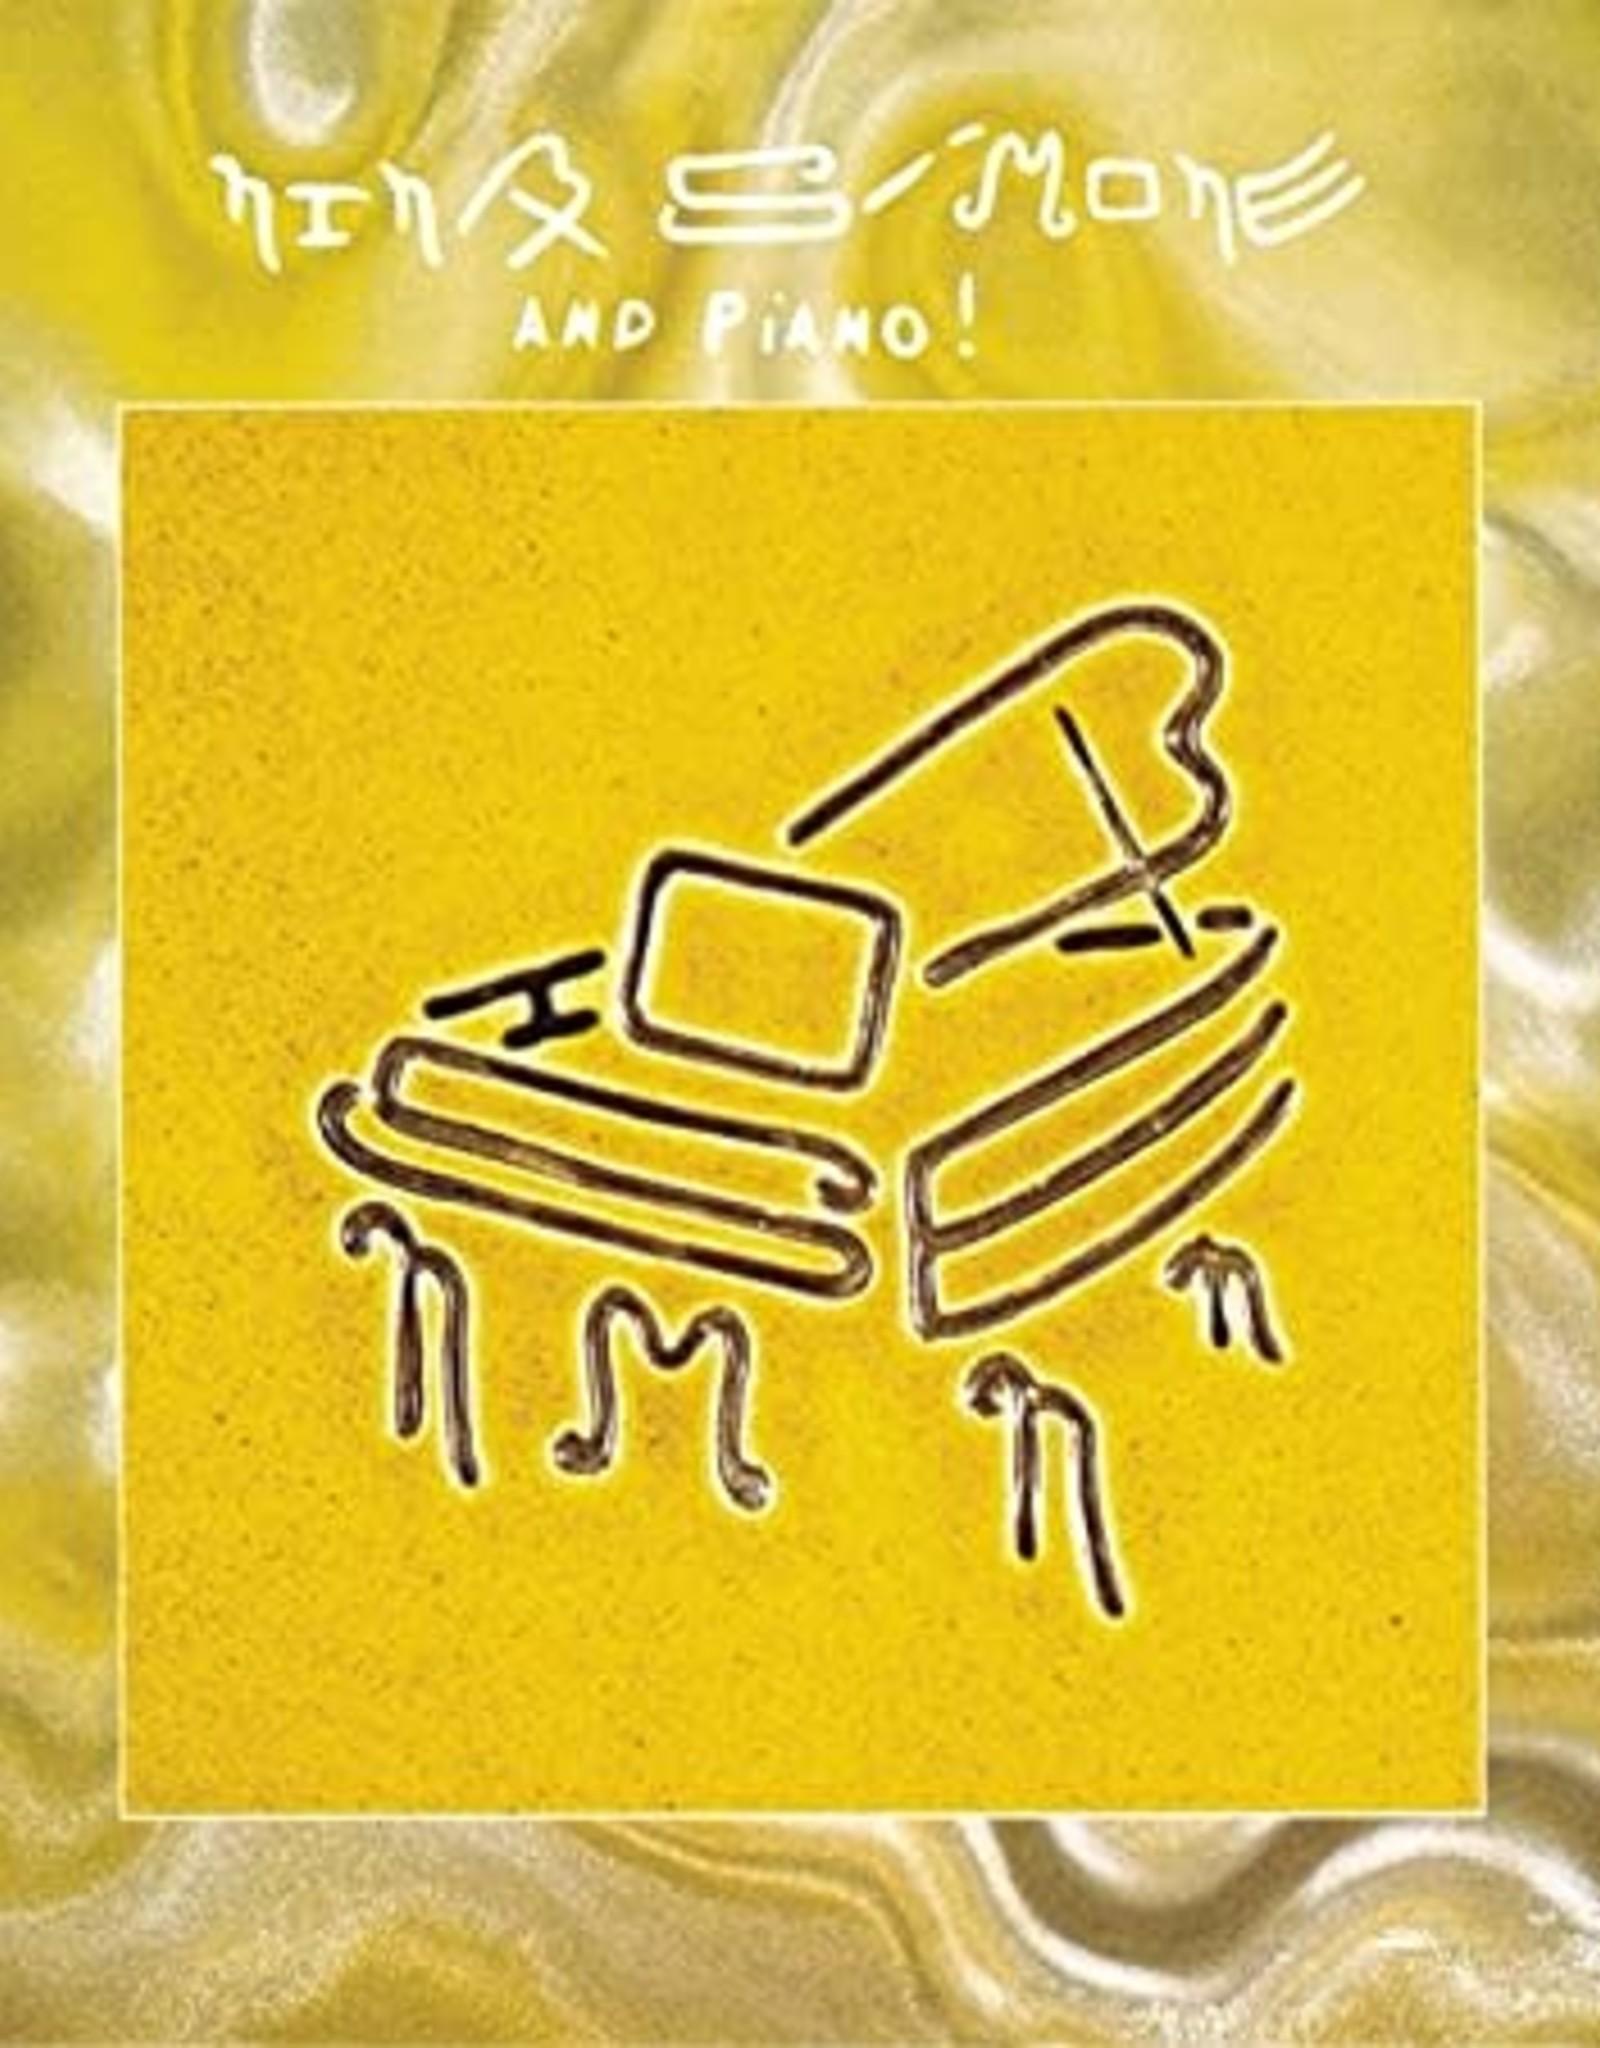 Nina Simone - And Piano!